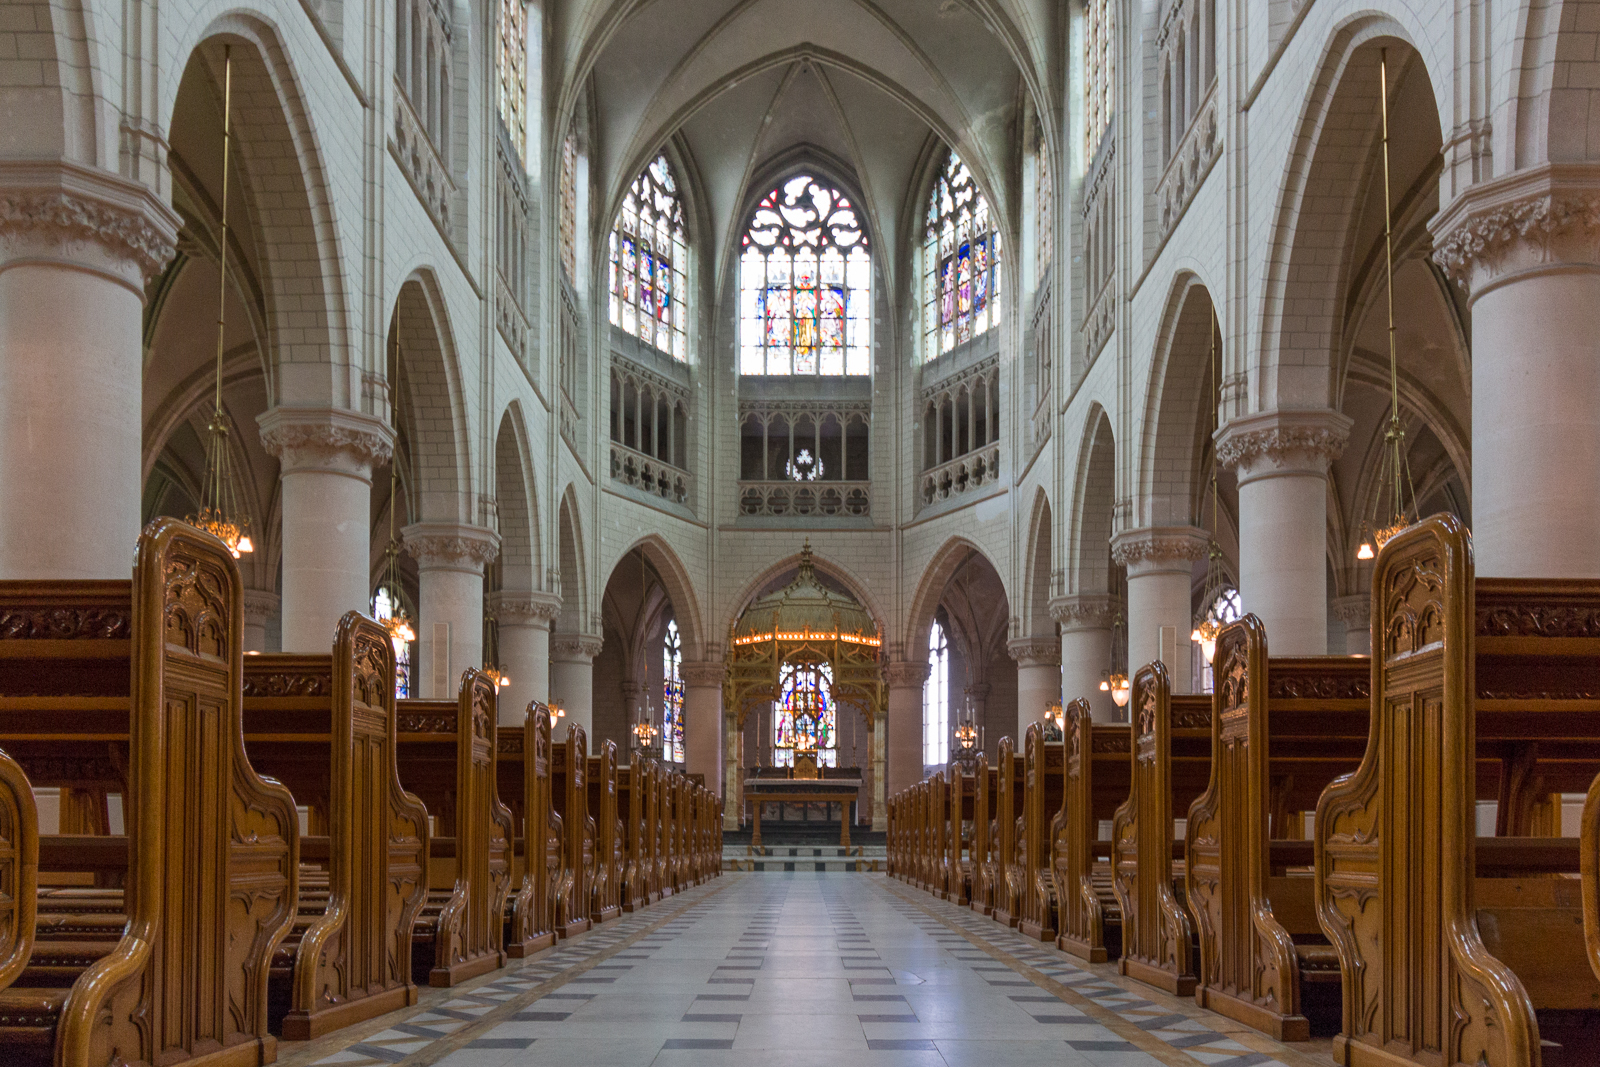 Mechelen, Onze-Lieve-Vrouw-Waver, Internet, Jugenstil, Ursulinen, Ursulinenkloster, Ausflugstipp